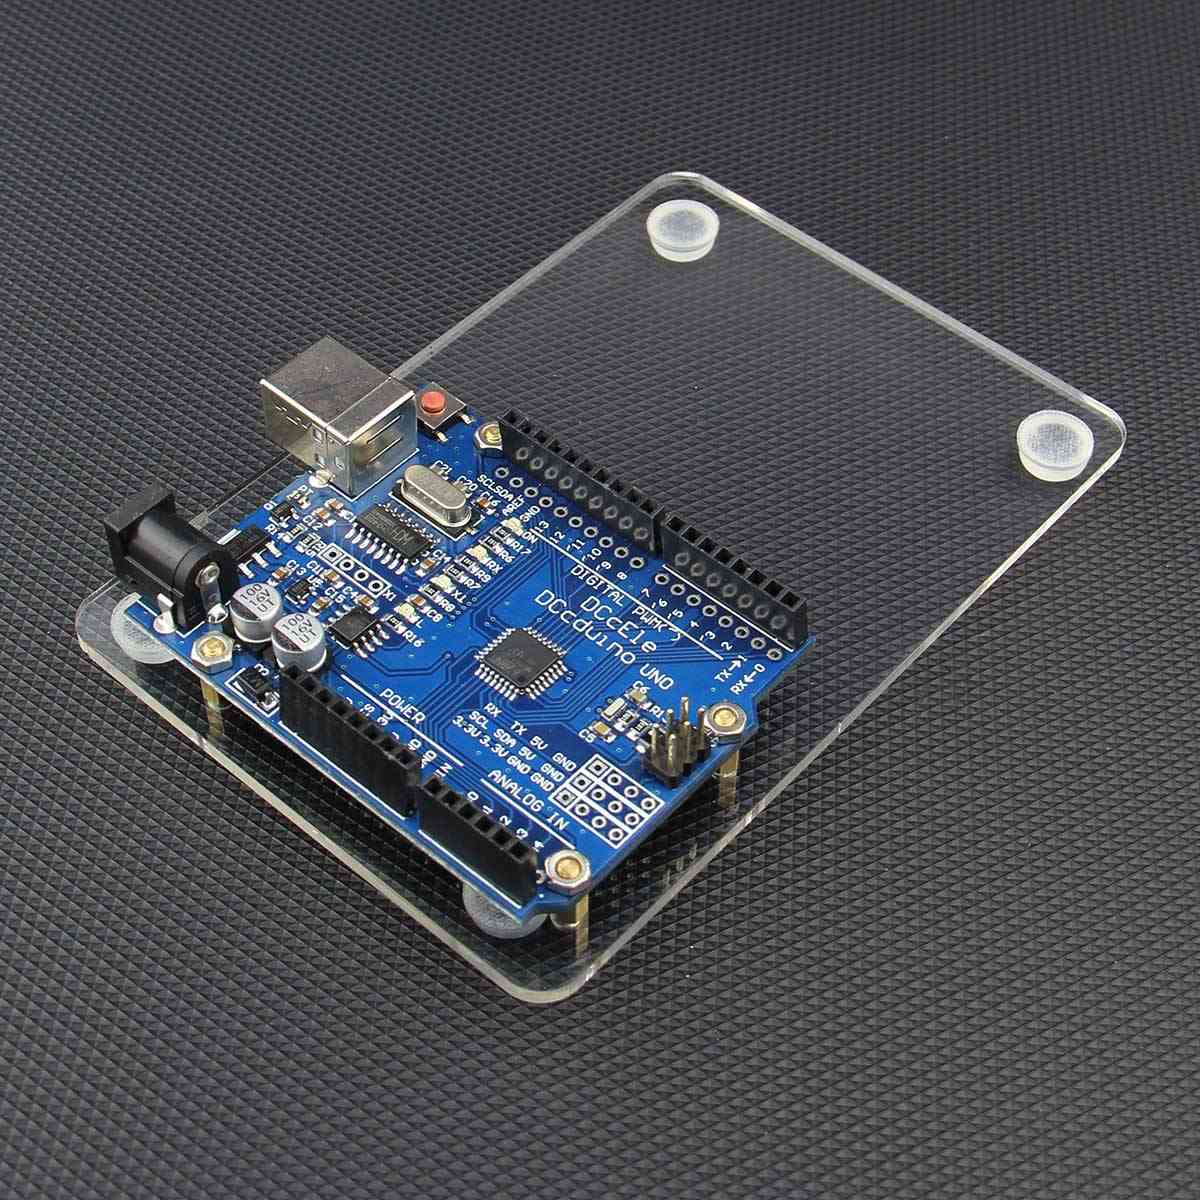 Amazoncom: arduino mounting board